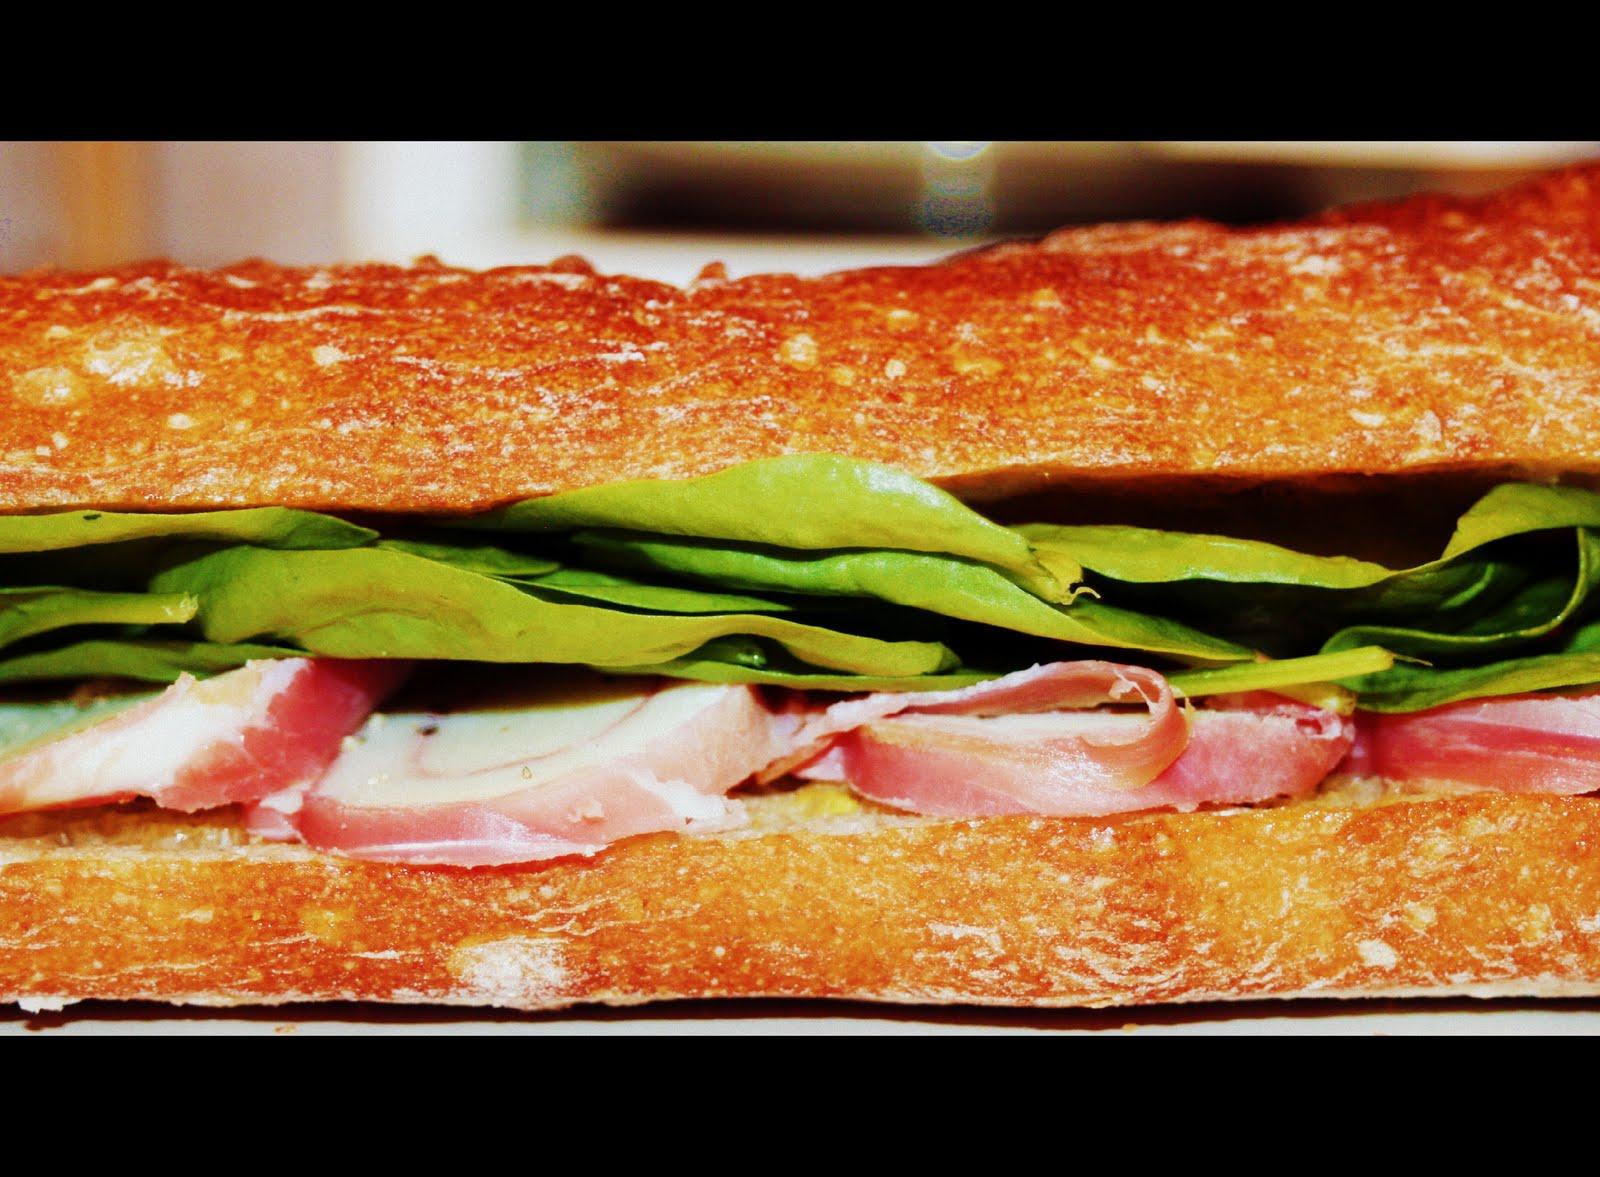 Summer Sandwiches. Image via Jessica Moseley Gordon